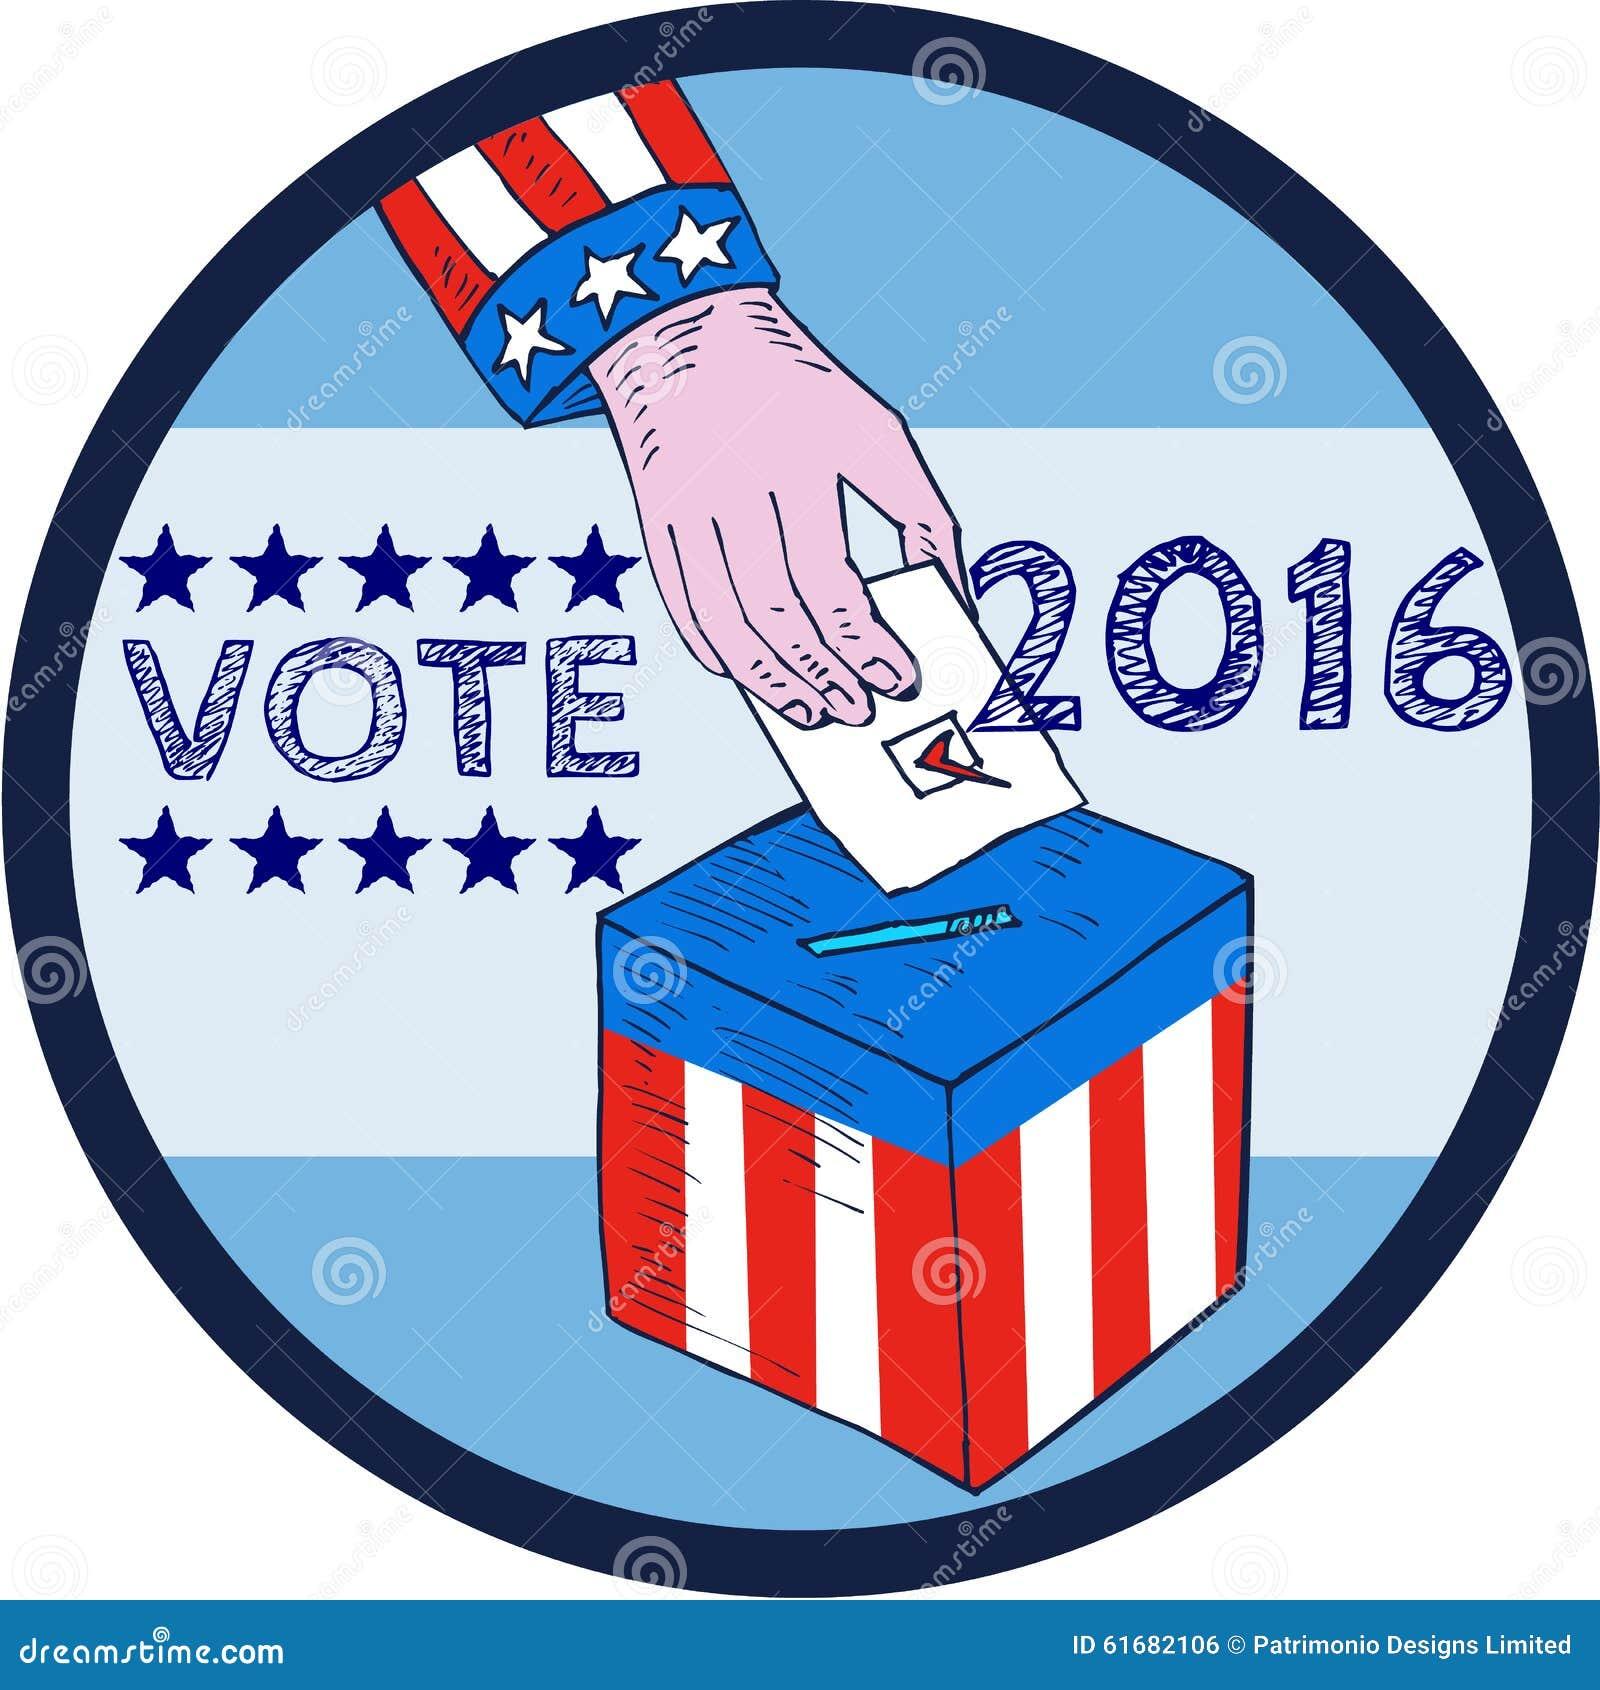 Vote 2016 Hand Ballot Box Circle Etching Stock ...